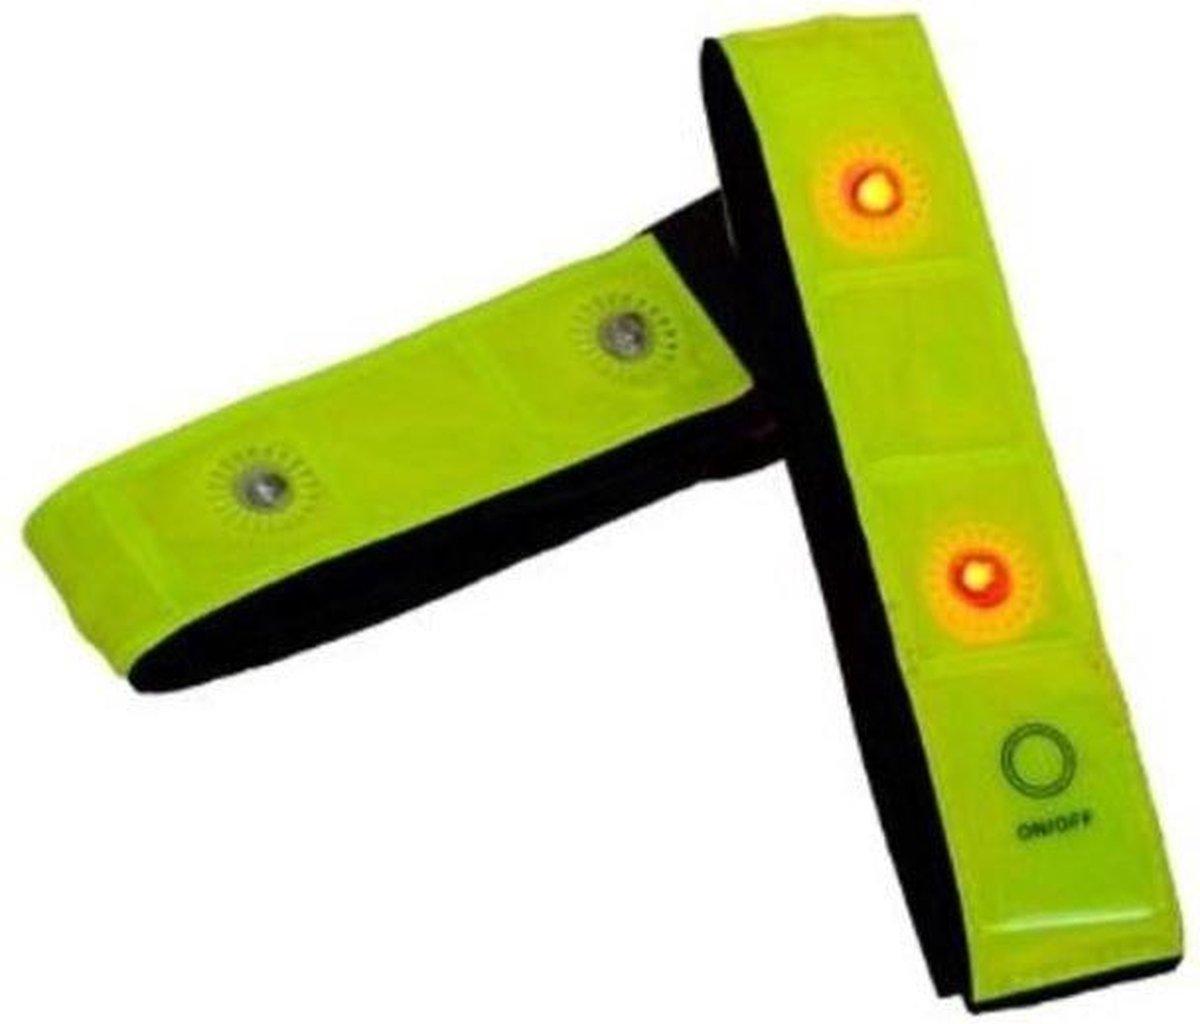 Rood Lichtgevende LED Veiligheidsband - 2 Stuks - Inclusief Batterij | Knipperend of Brandend Licht ® - Morsal's World